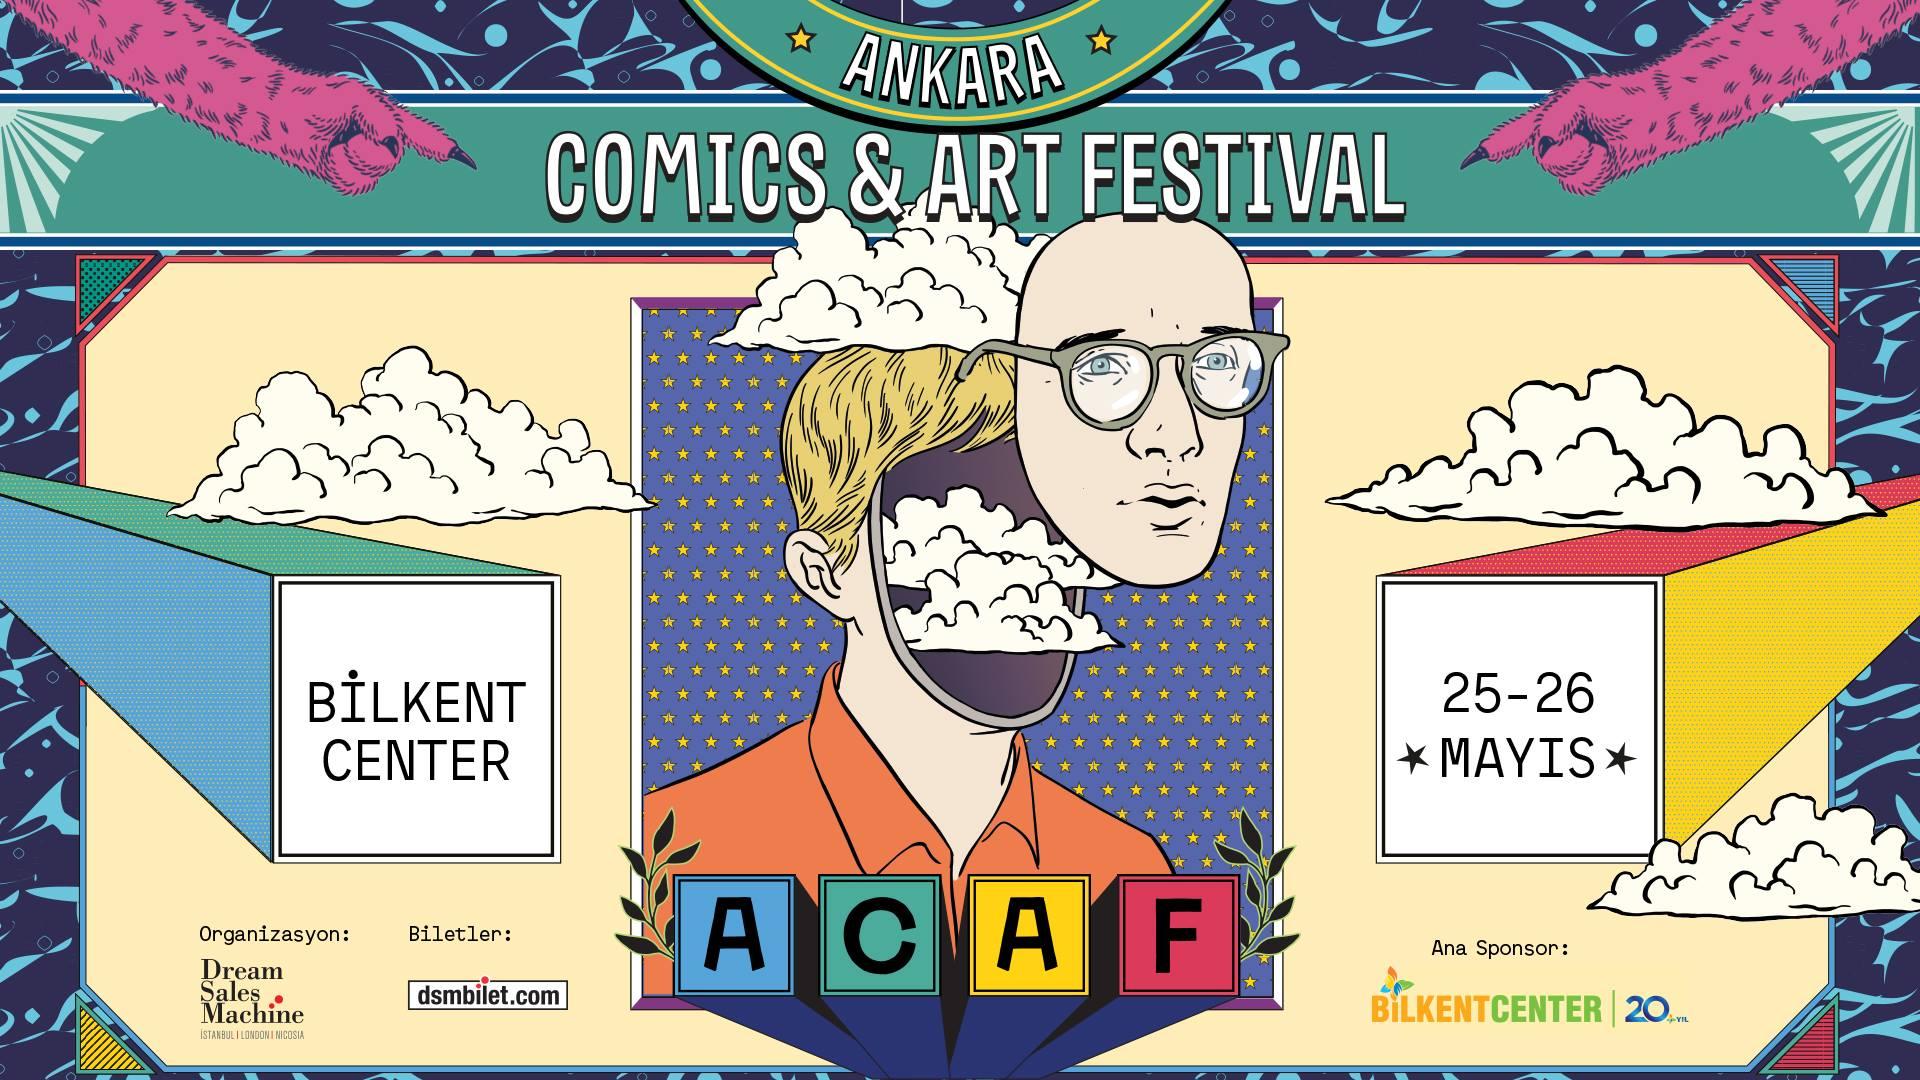 Ankara Comics & Art Festival, 25-26 Mayıs, Bilkent Center / Ankara